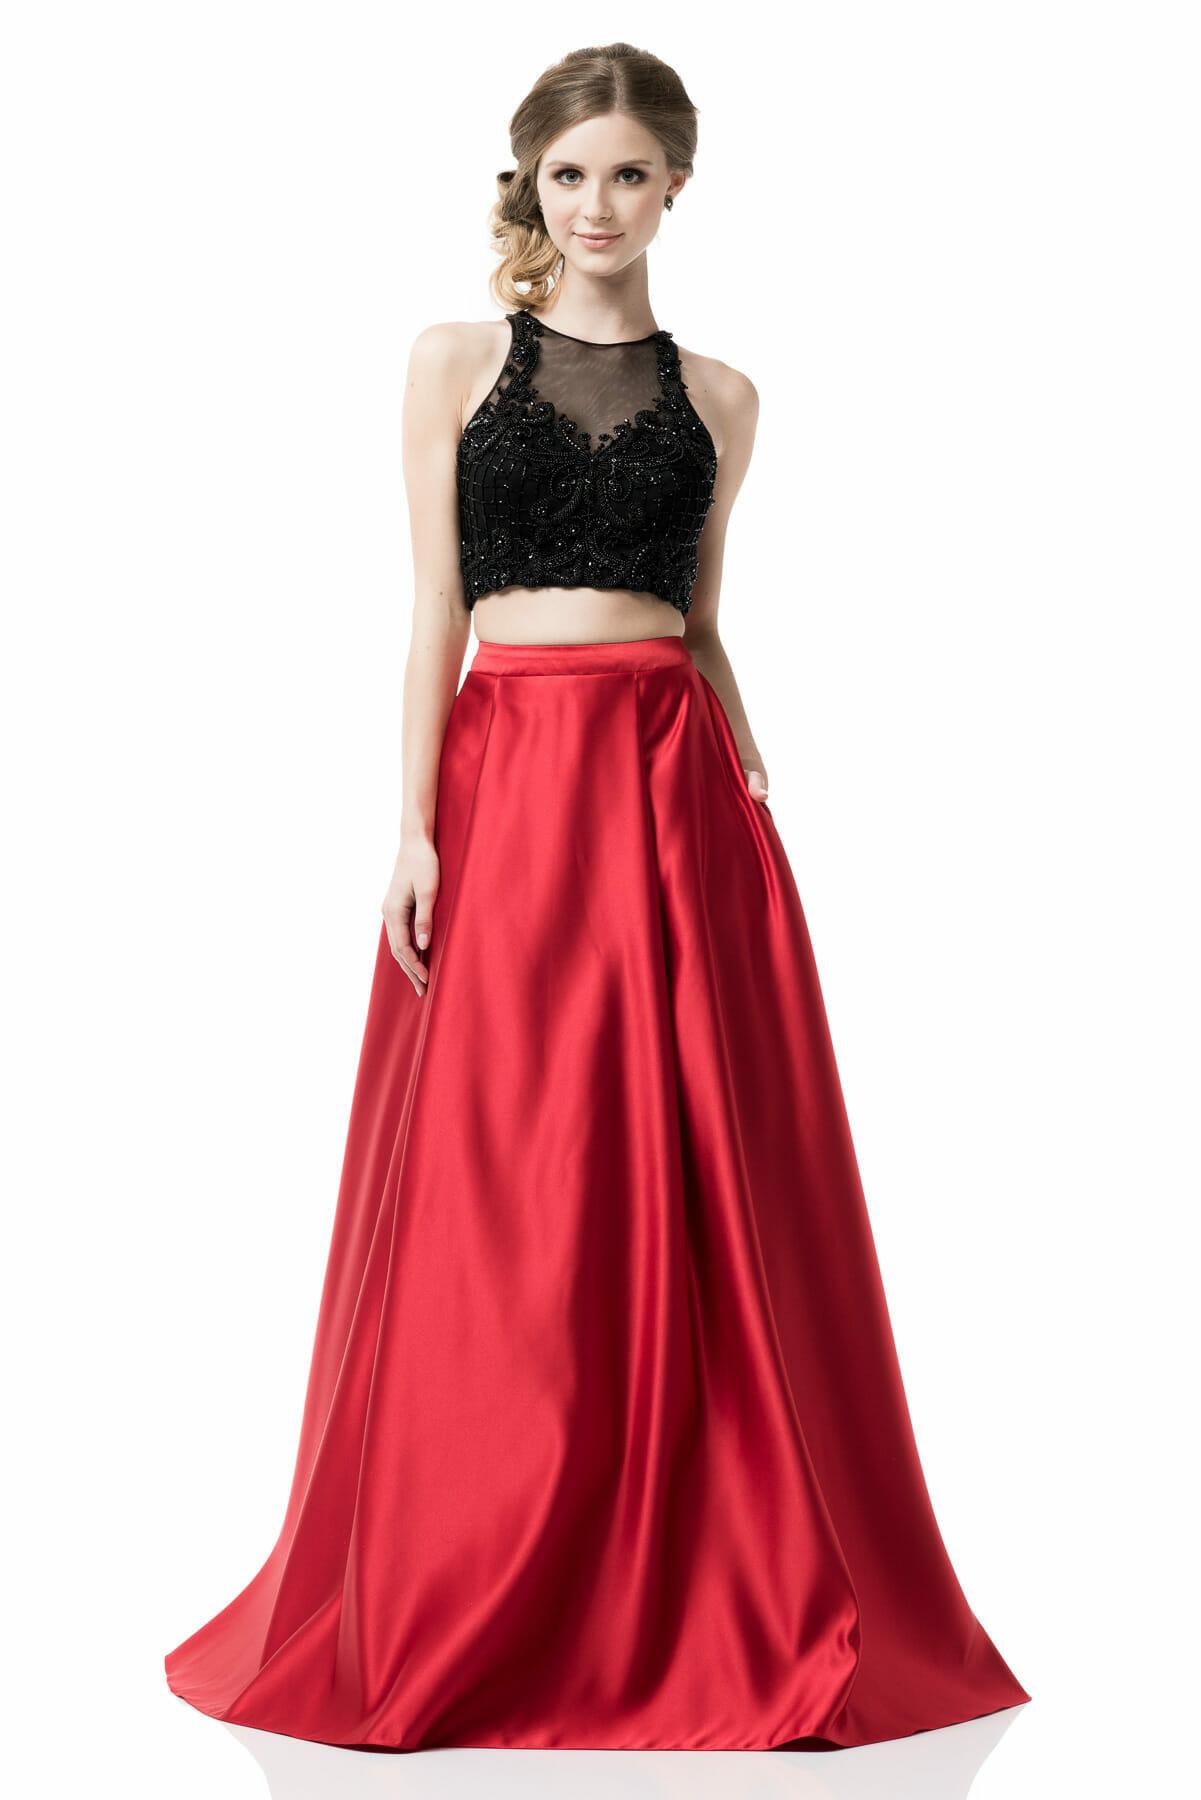 Relieving Woman 2 Piece Set Scoop Neck Sleeveless A Line 2 Piece Dresses Prom 2 Piece Dresses wedding dress 2 Piece Dresses